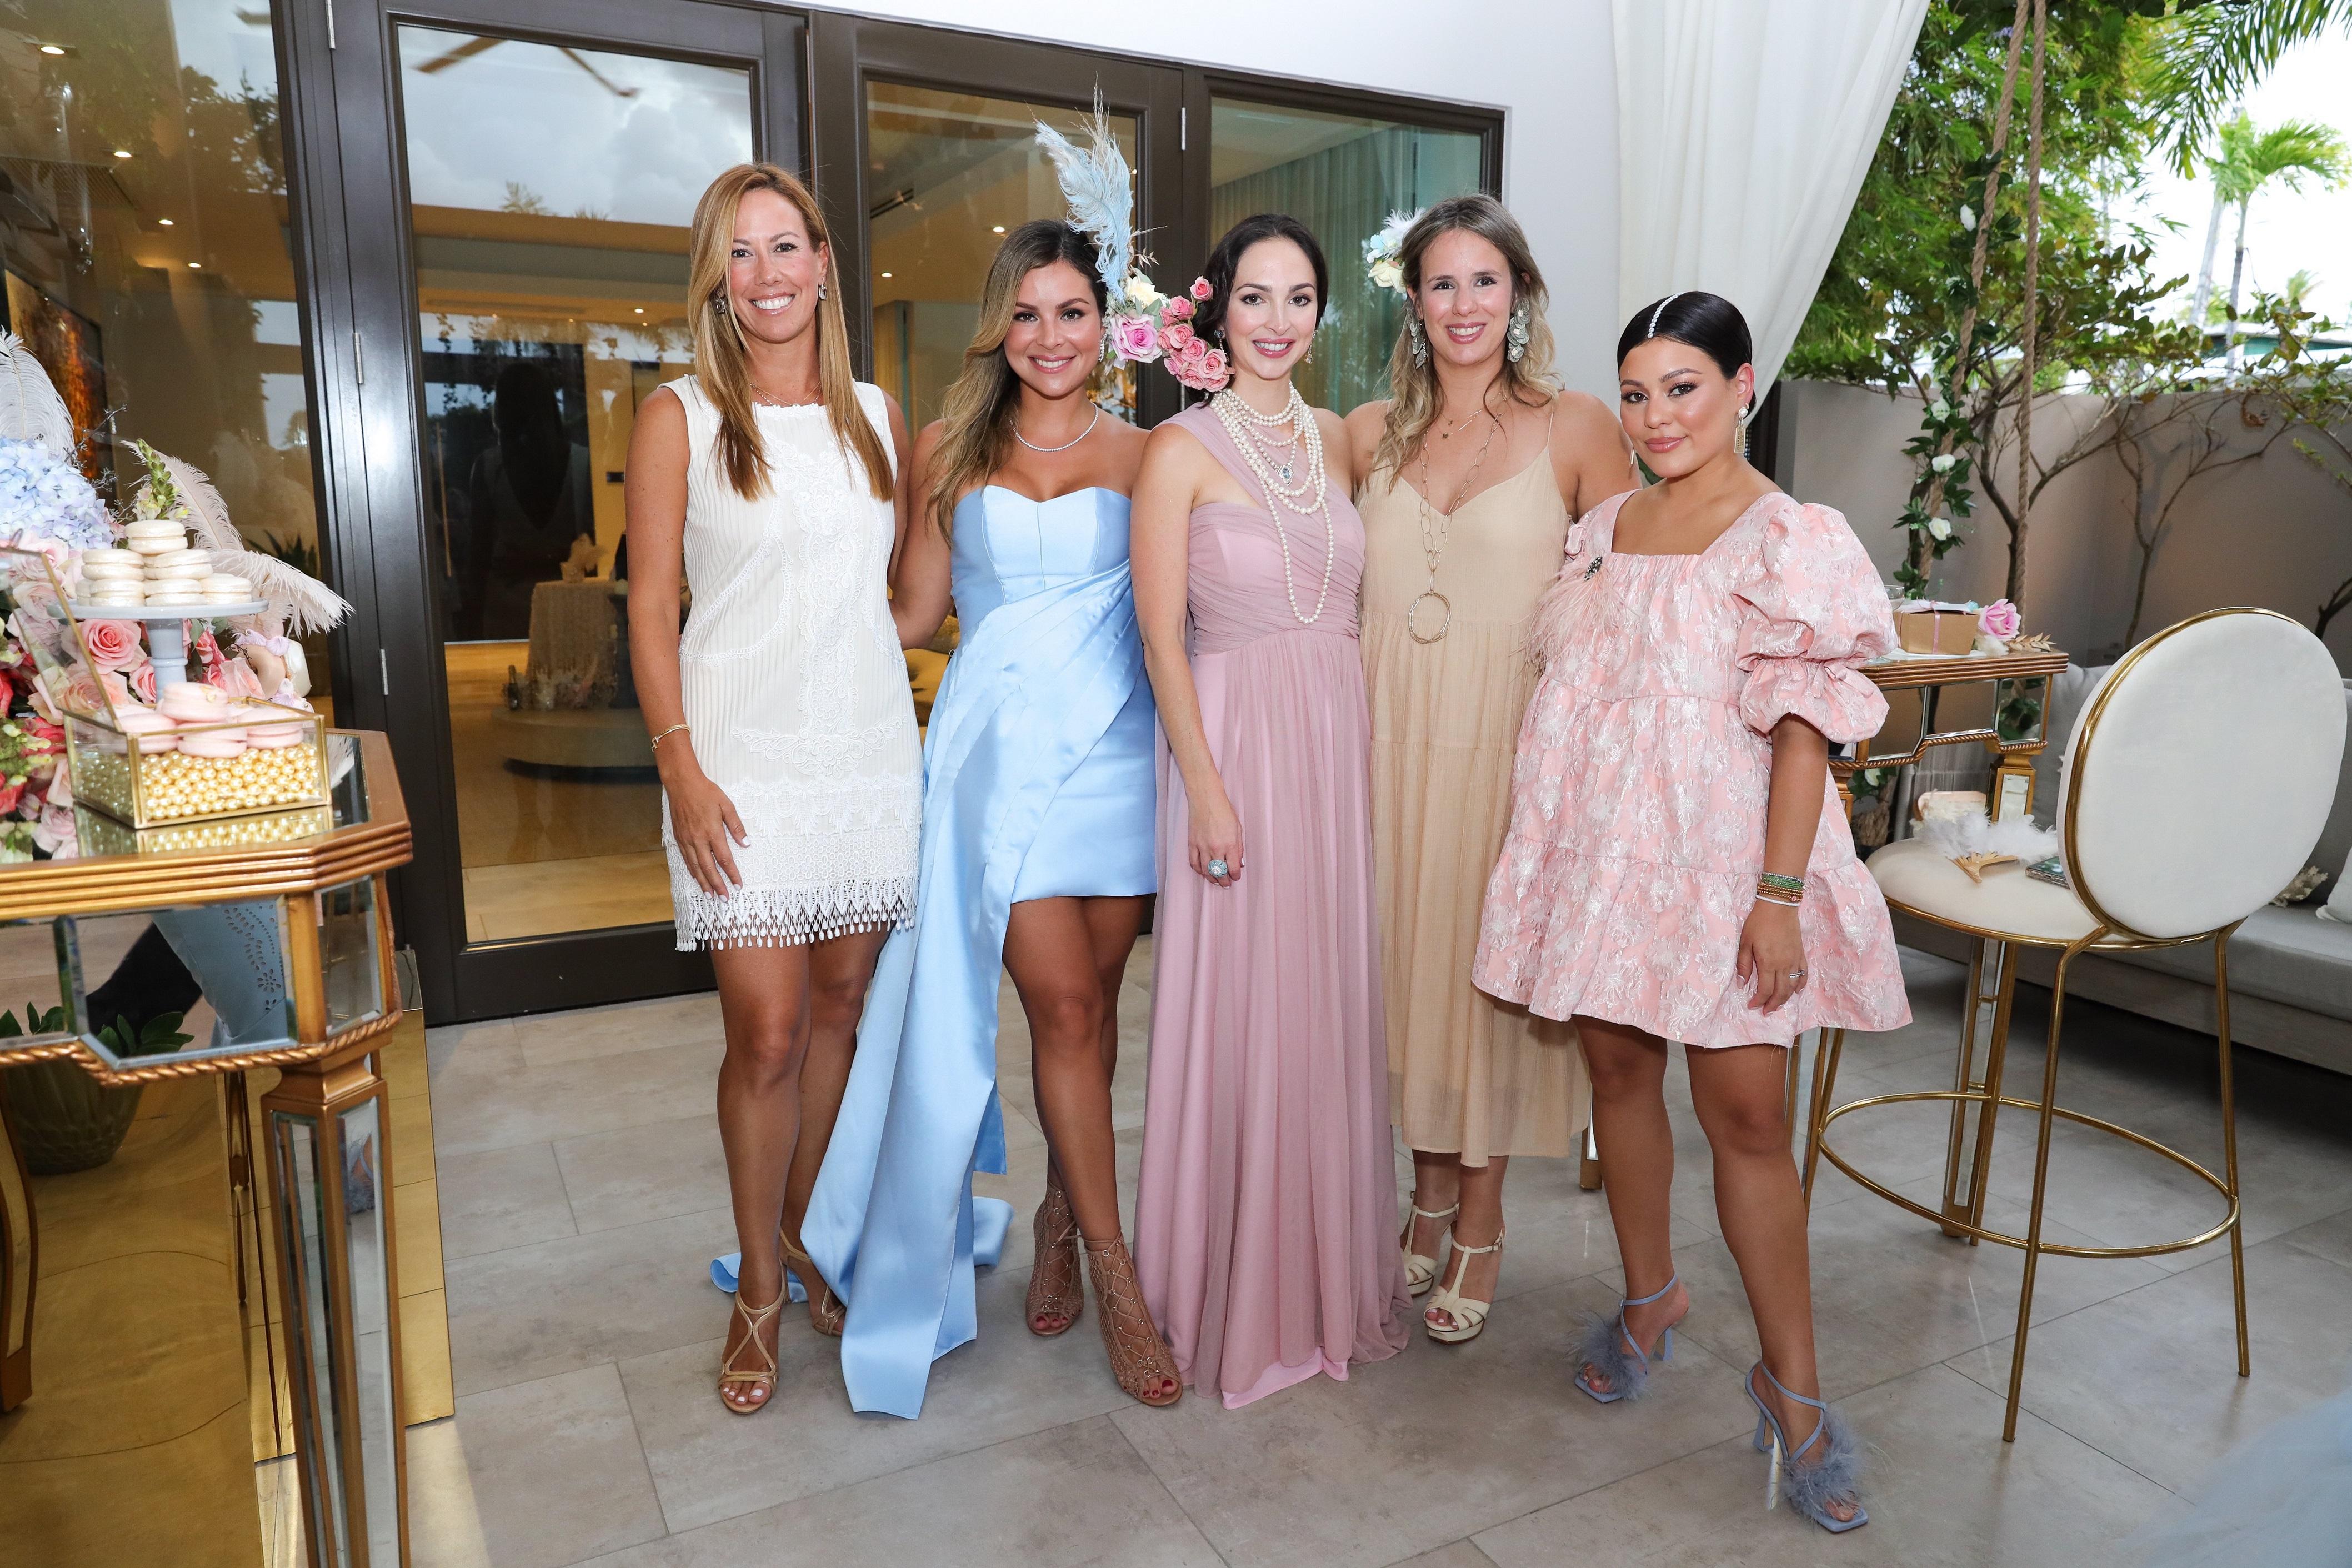 Carola García, Mónica Ponce, Claudia Ferrer, Alexandra Martin y Carolina Bermúdez. (Suministrada/Karina Margary)